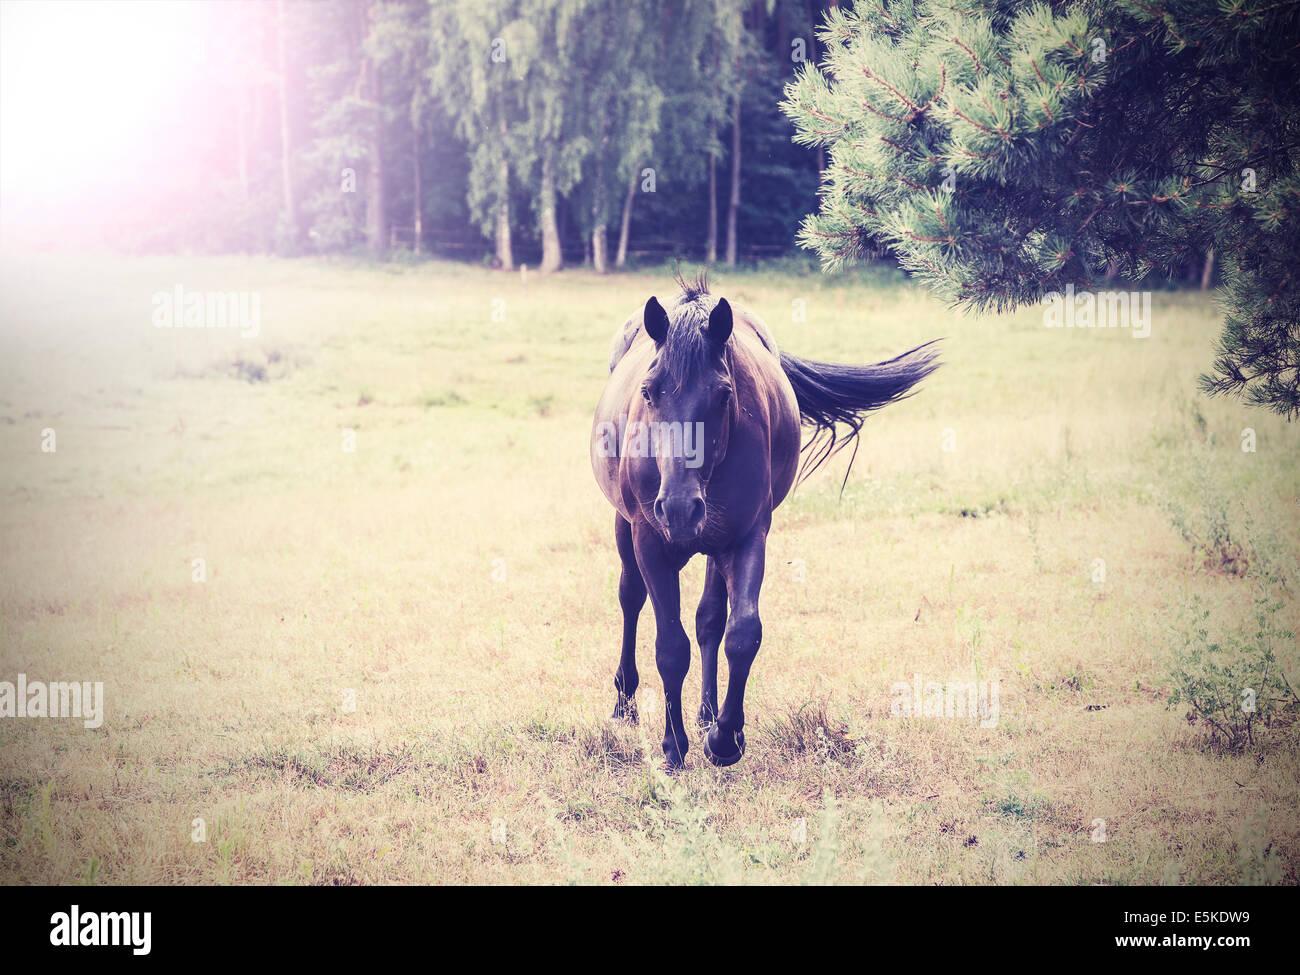 horse vintage retro style - Stock Image